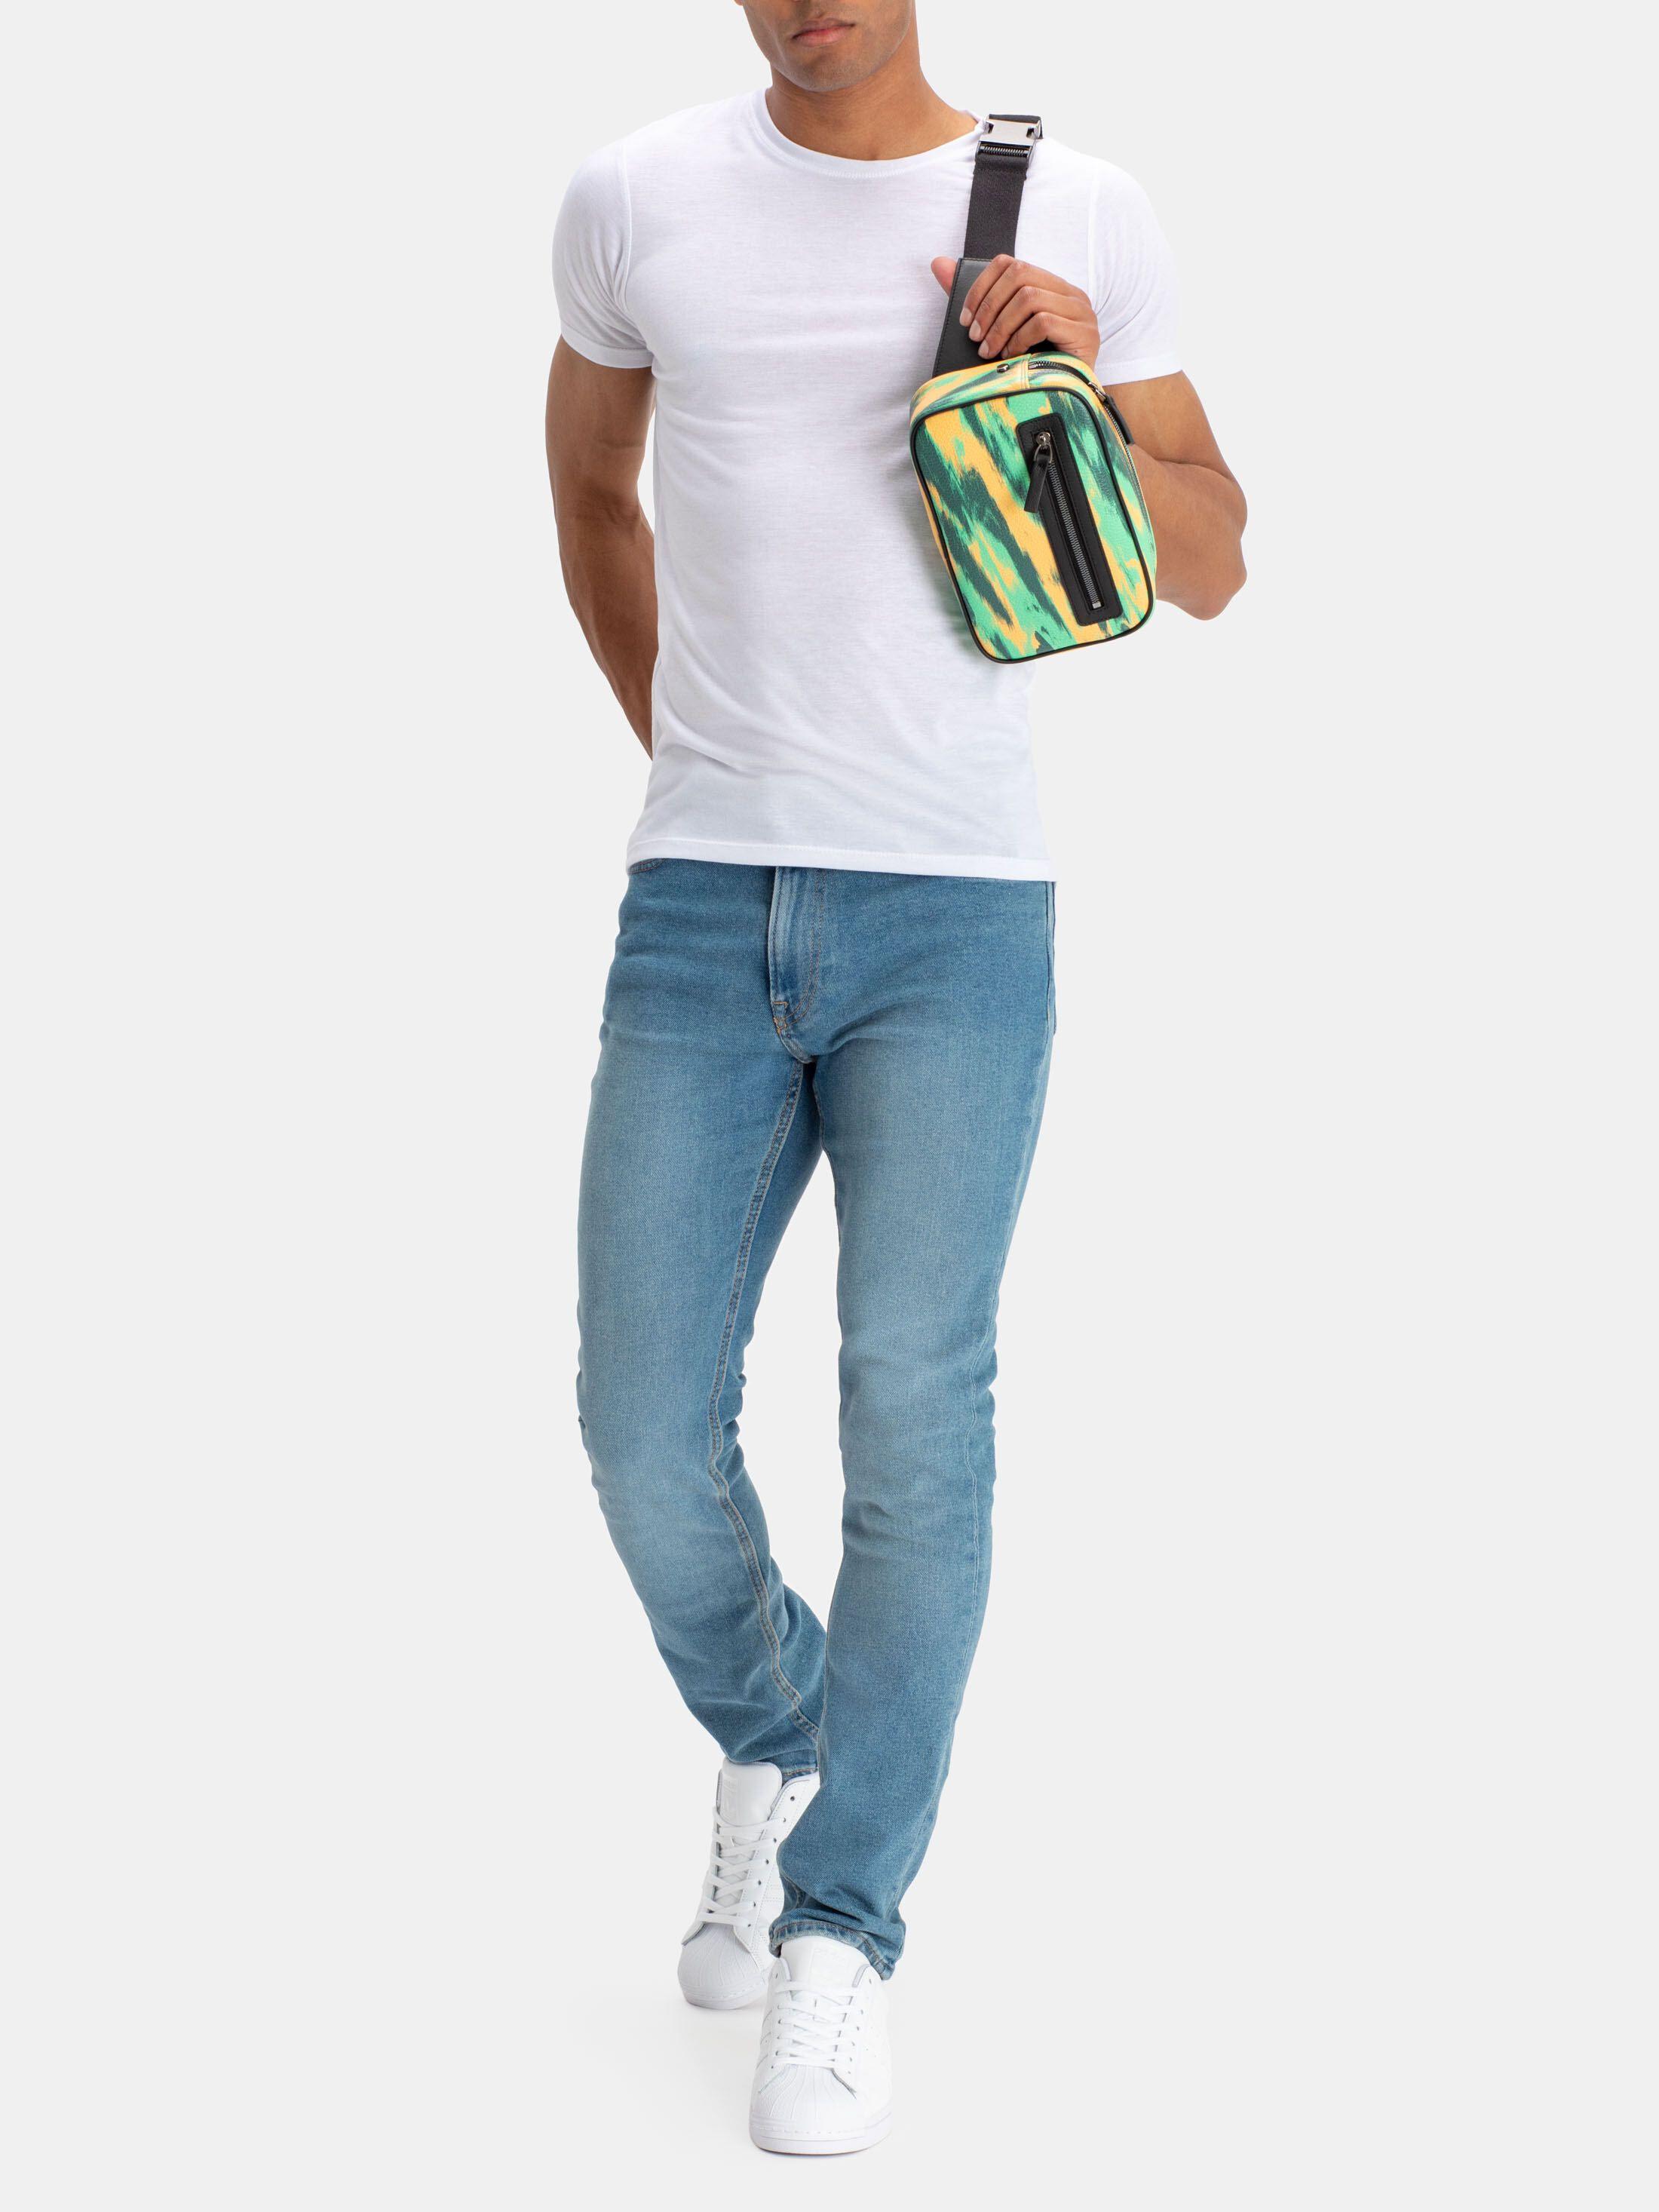 Custom bum bag nz